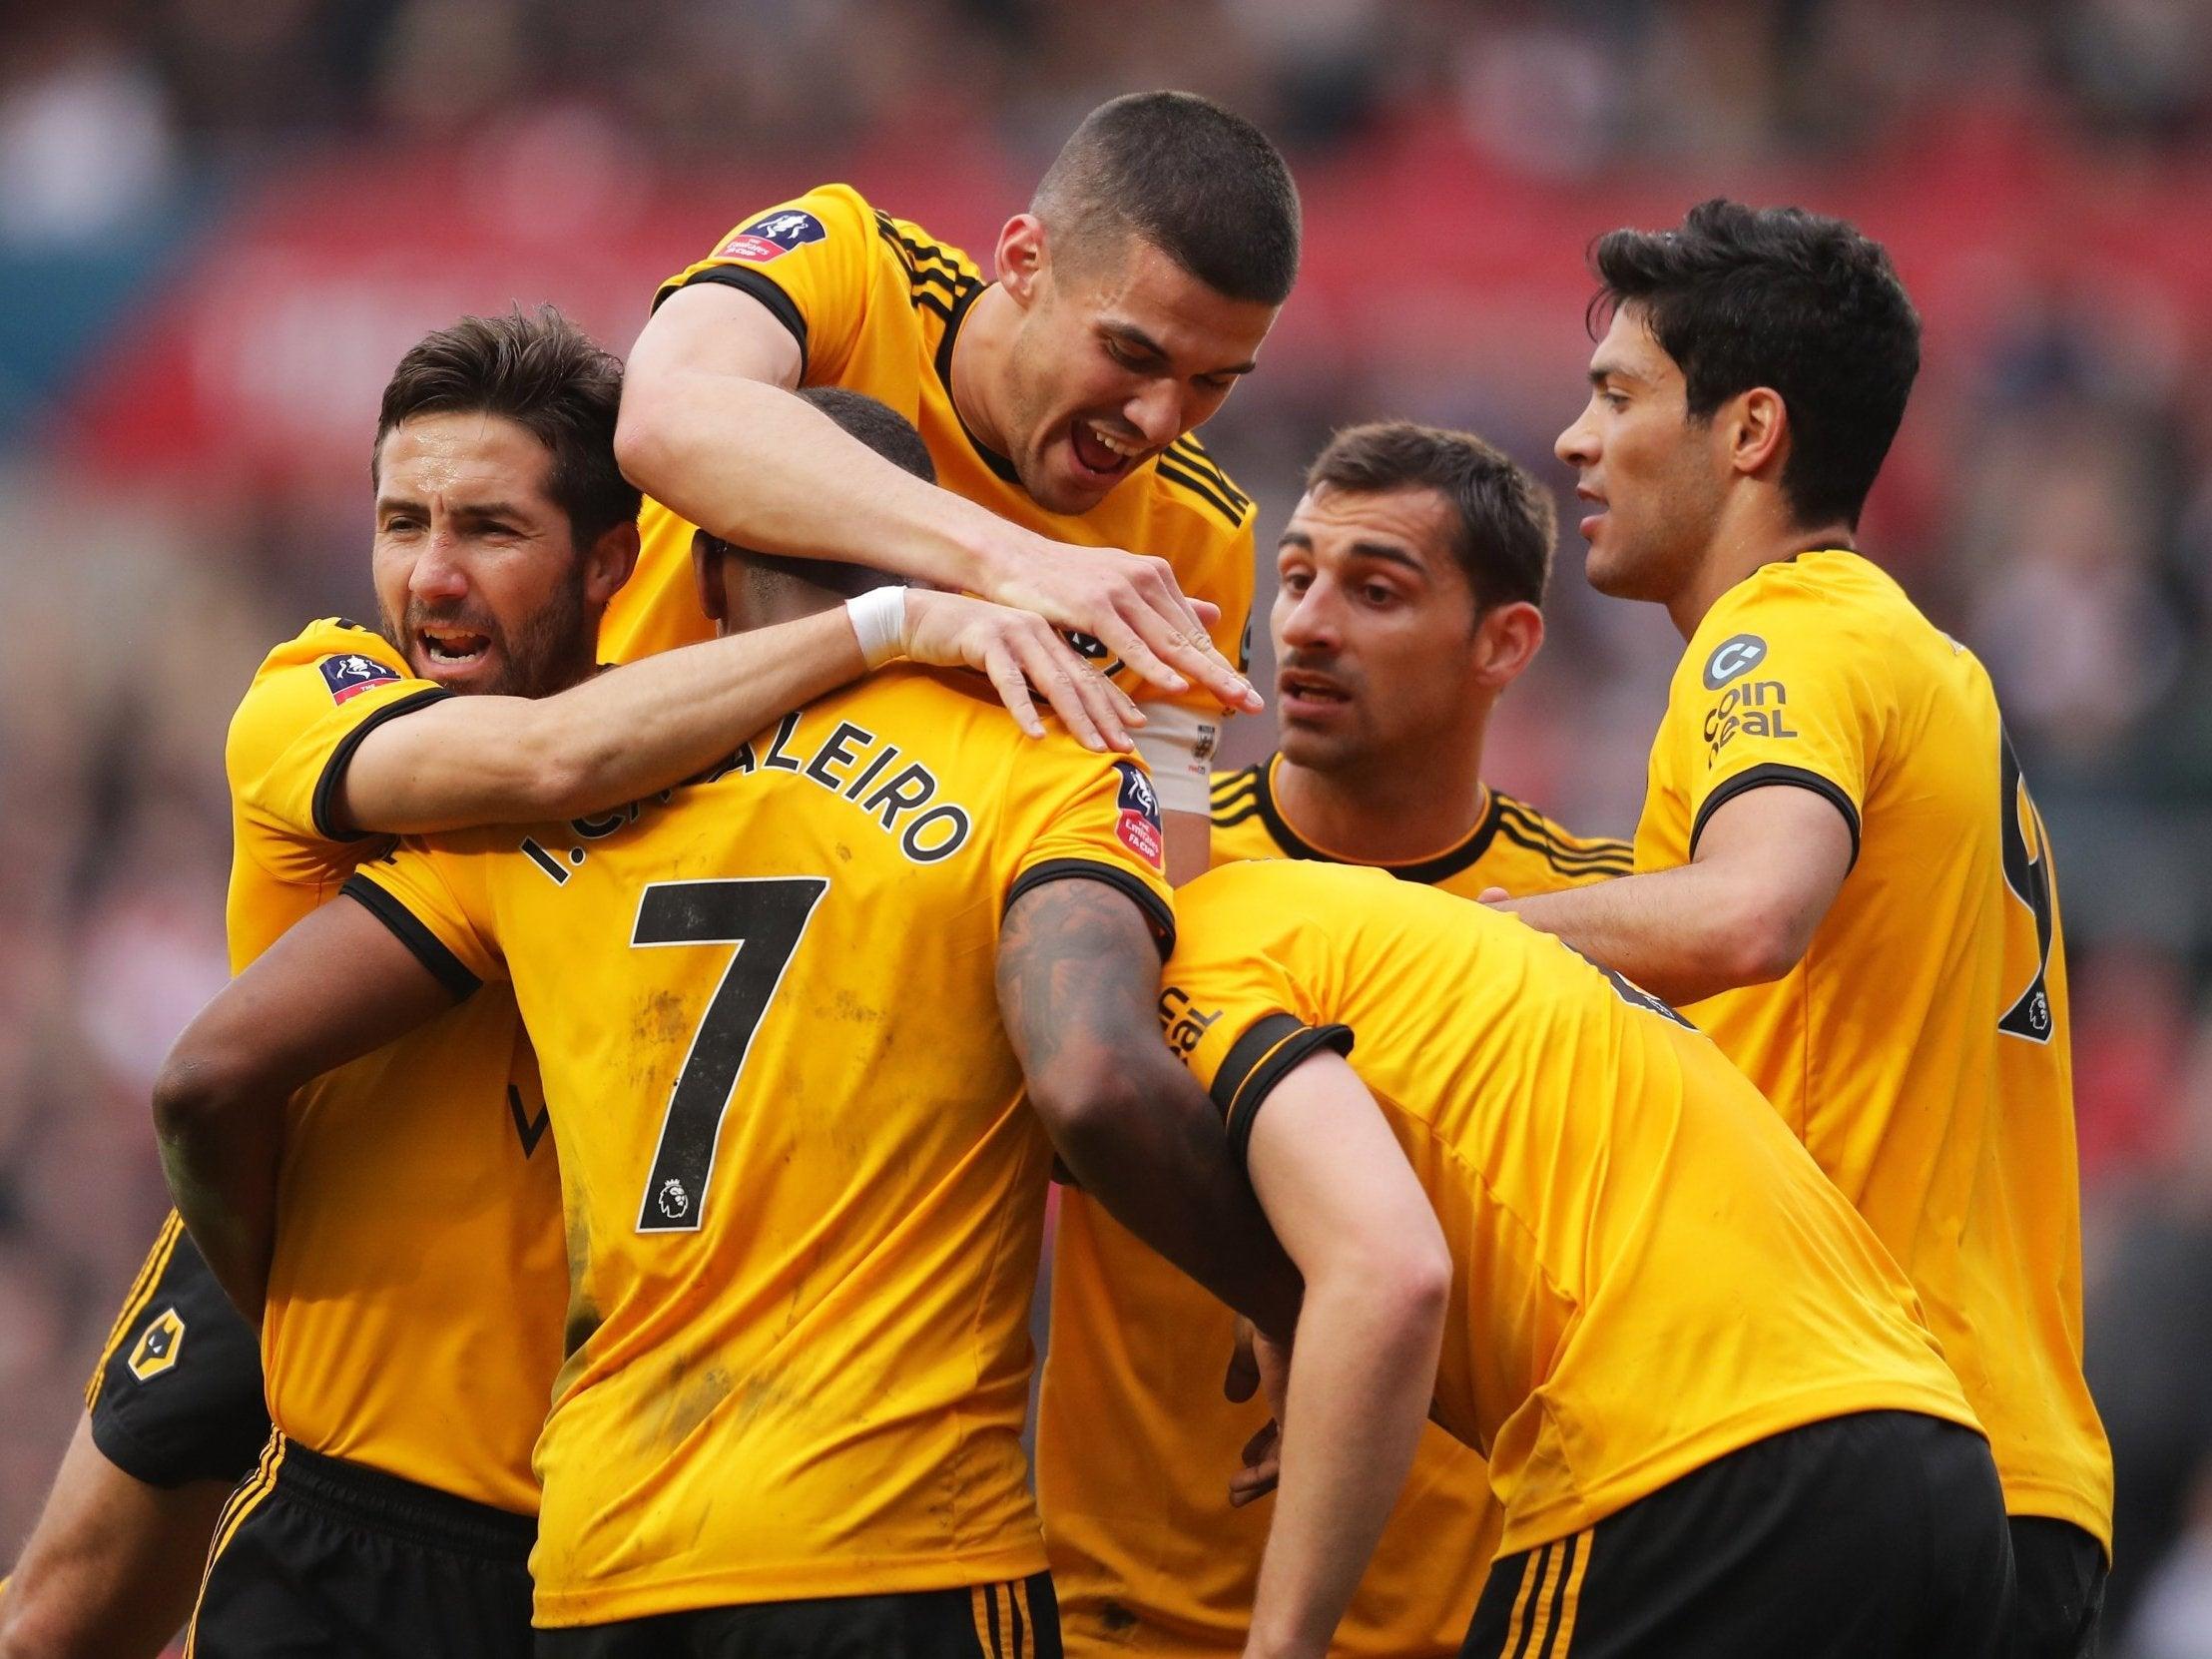 Bristol City vs Wolves: Ivan Cavaleiro edges Nuno Espirito Santo's side into FA Cup quarter-finals